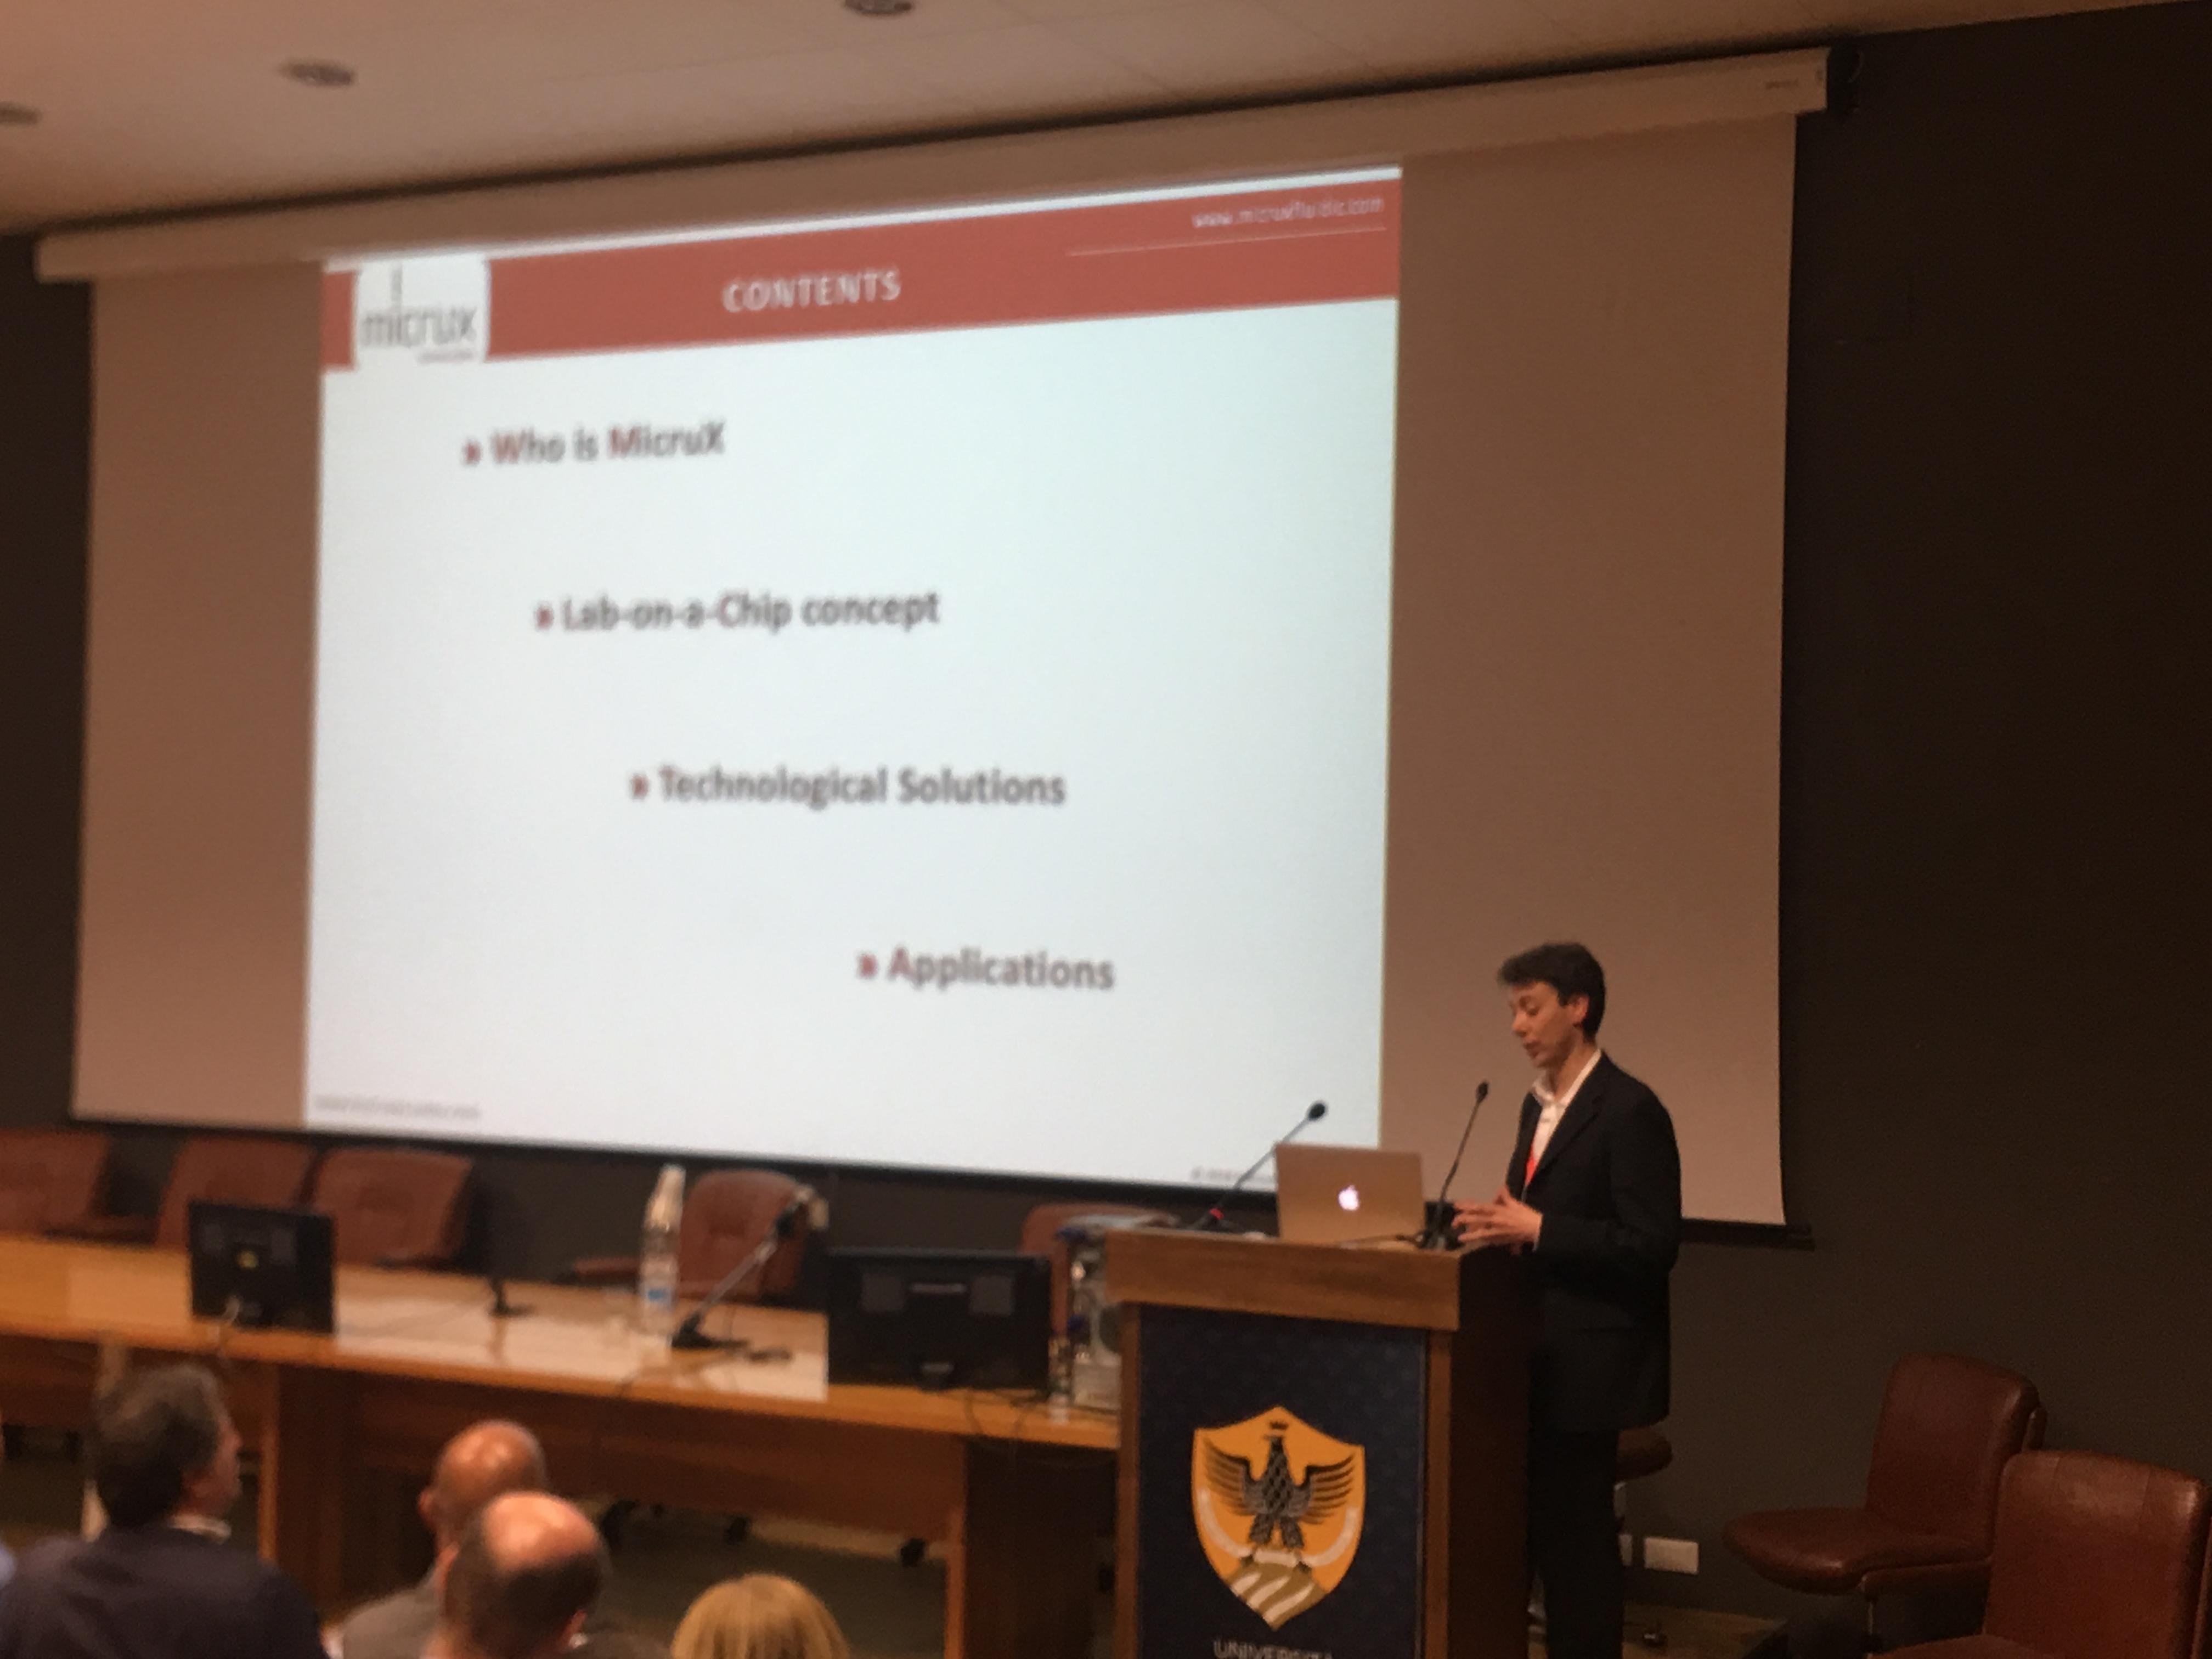 Dr. Castano Alvarez, MicruX Technologies